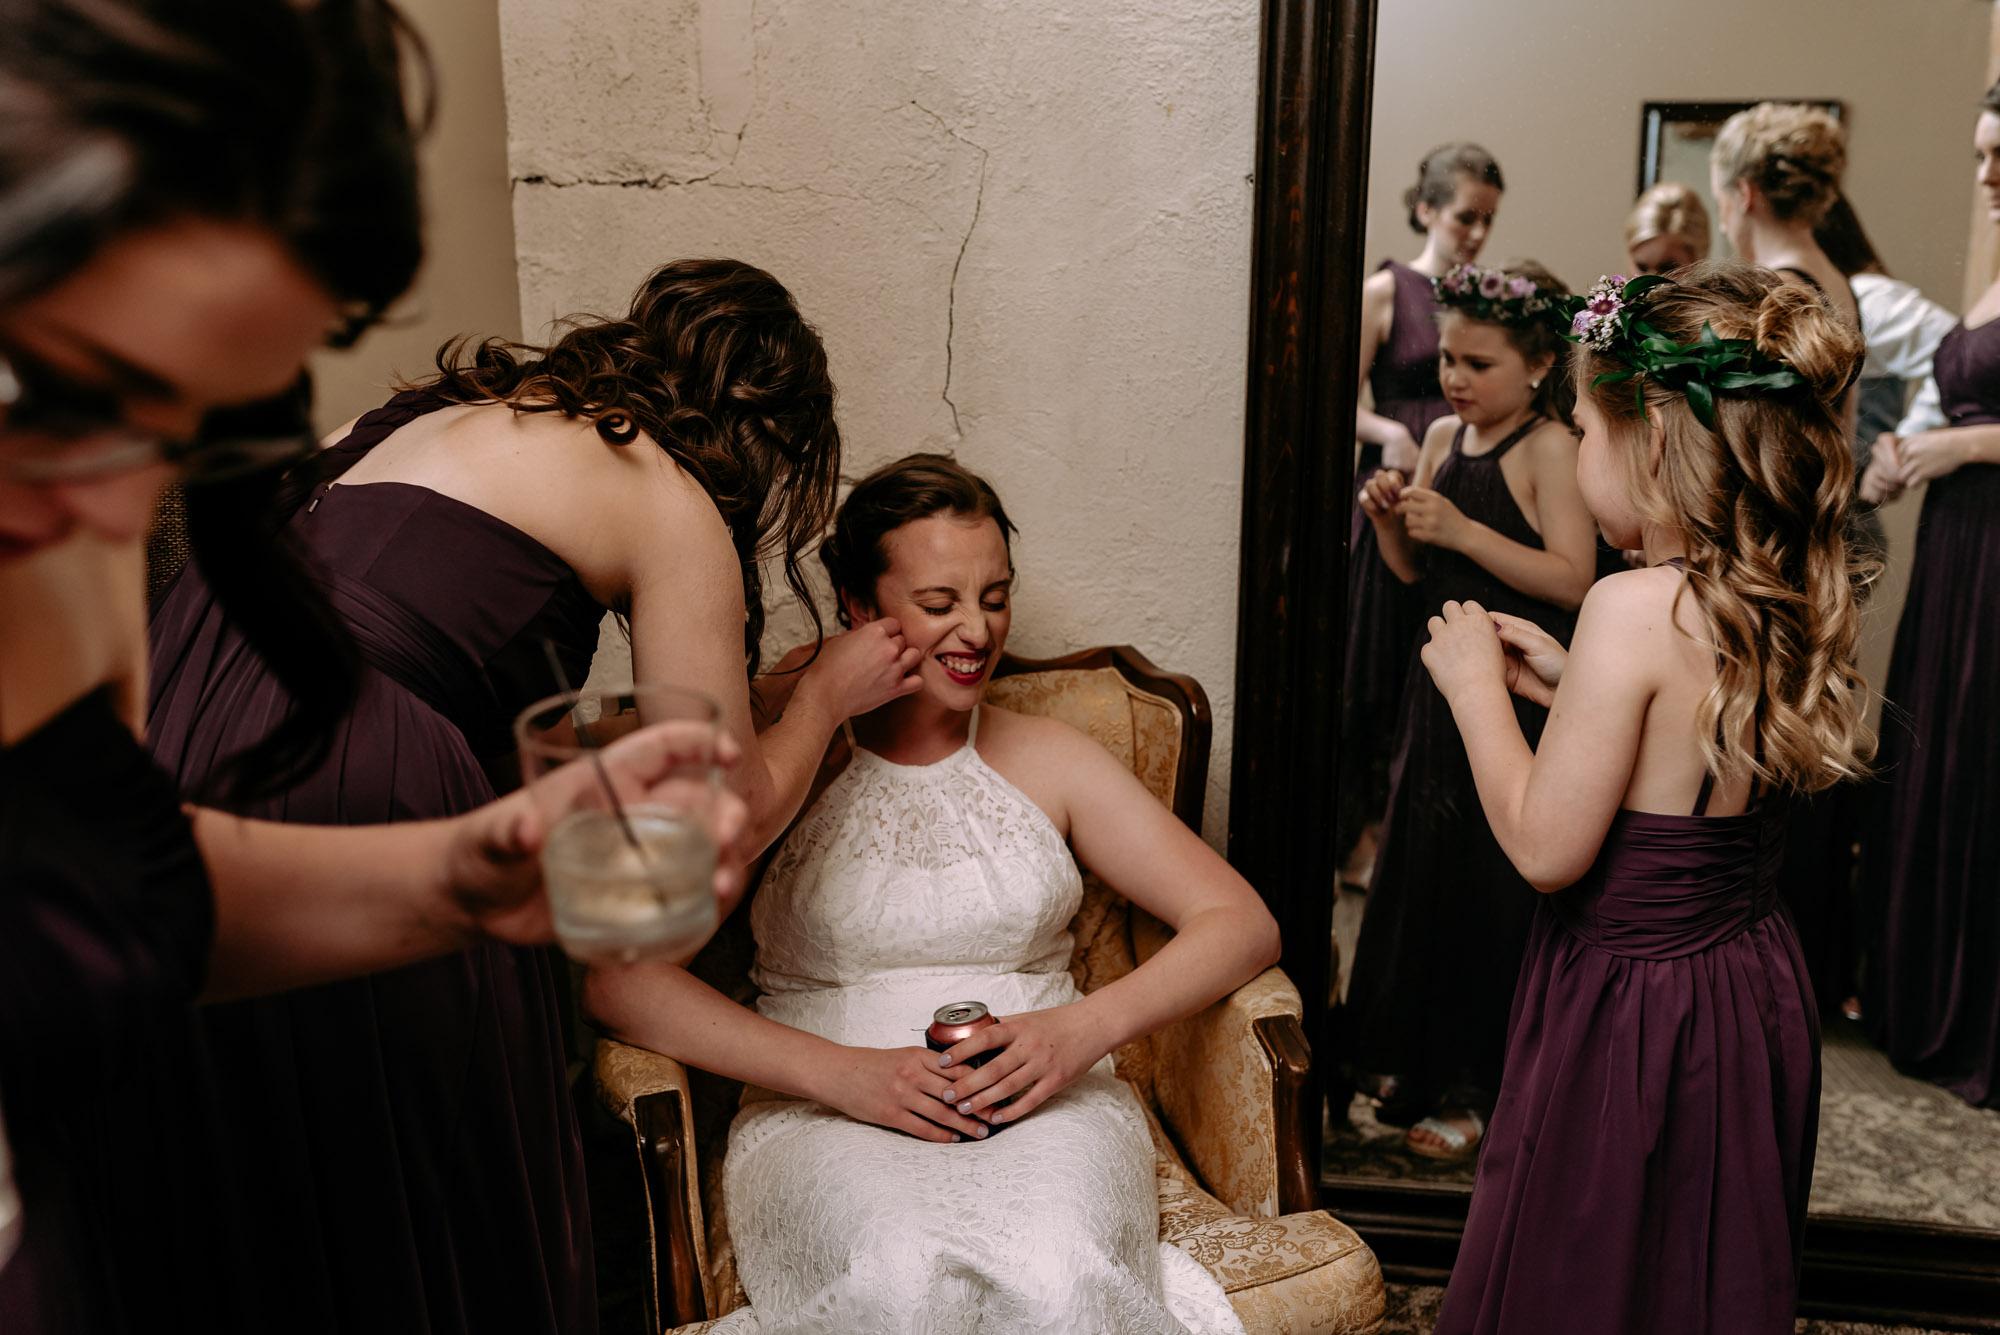 prairie-street-brewhouse-wedding-Rockford-IL-wedding-photographers-31.jpg